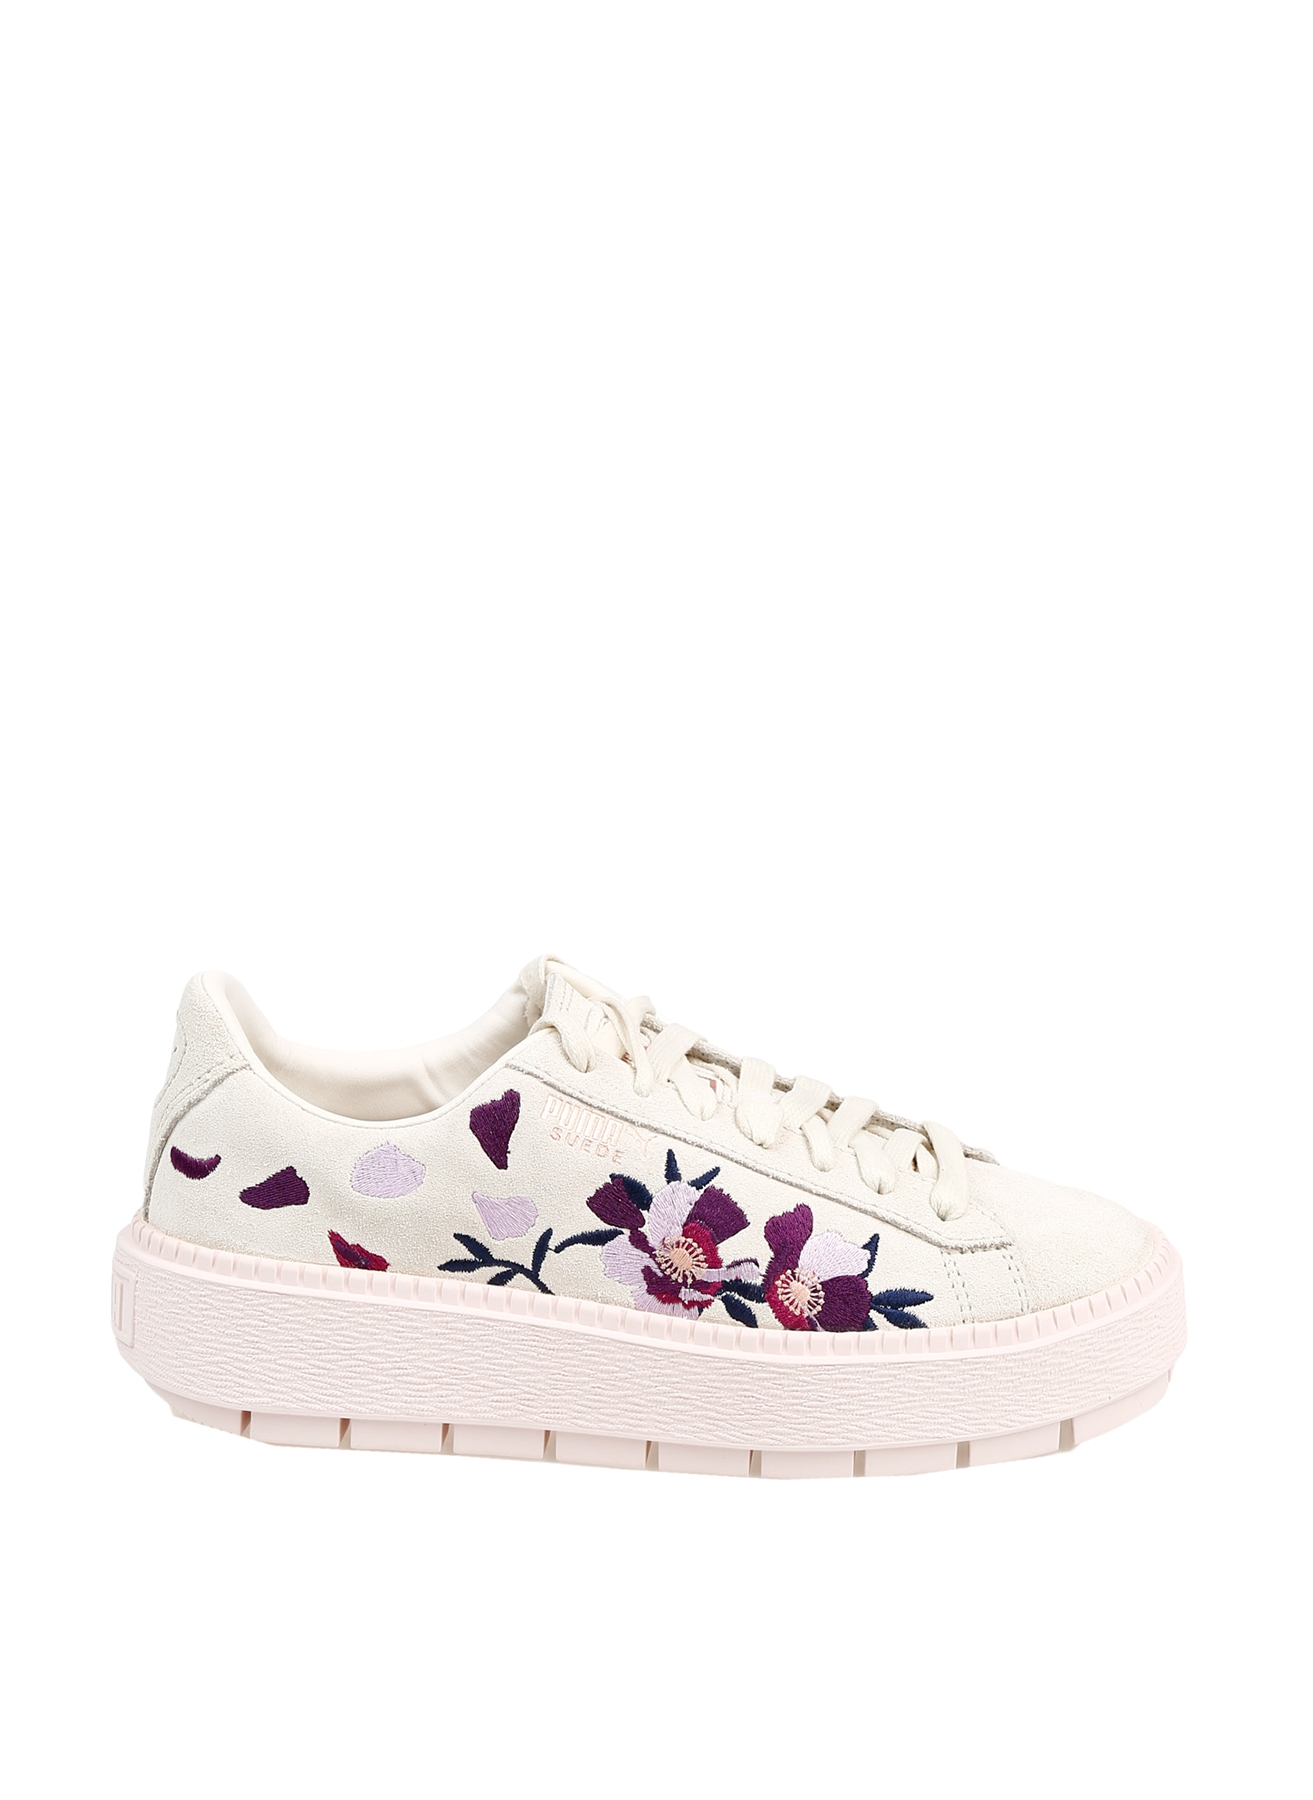 Puma Suede Platform Trace Flowery Lifestyle Ayakkabı 36 5001632652001 Ürün Resmi